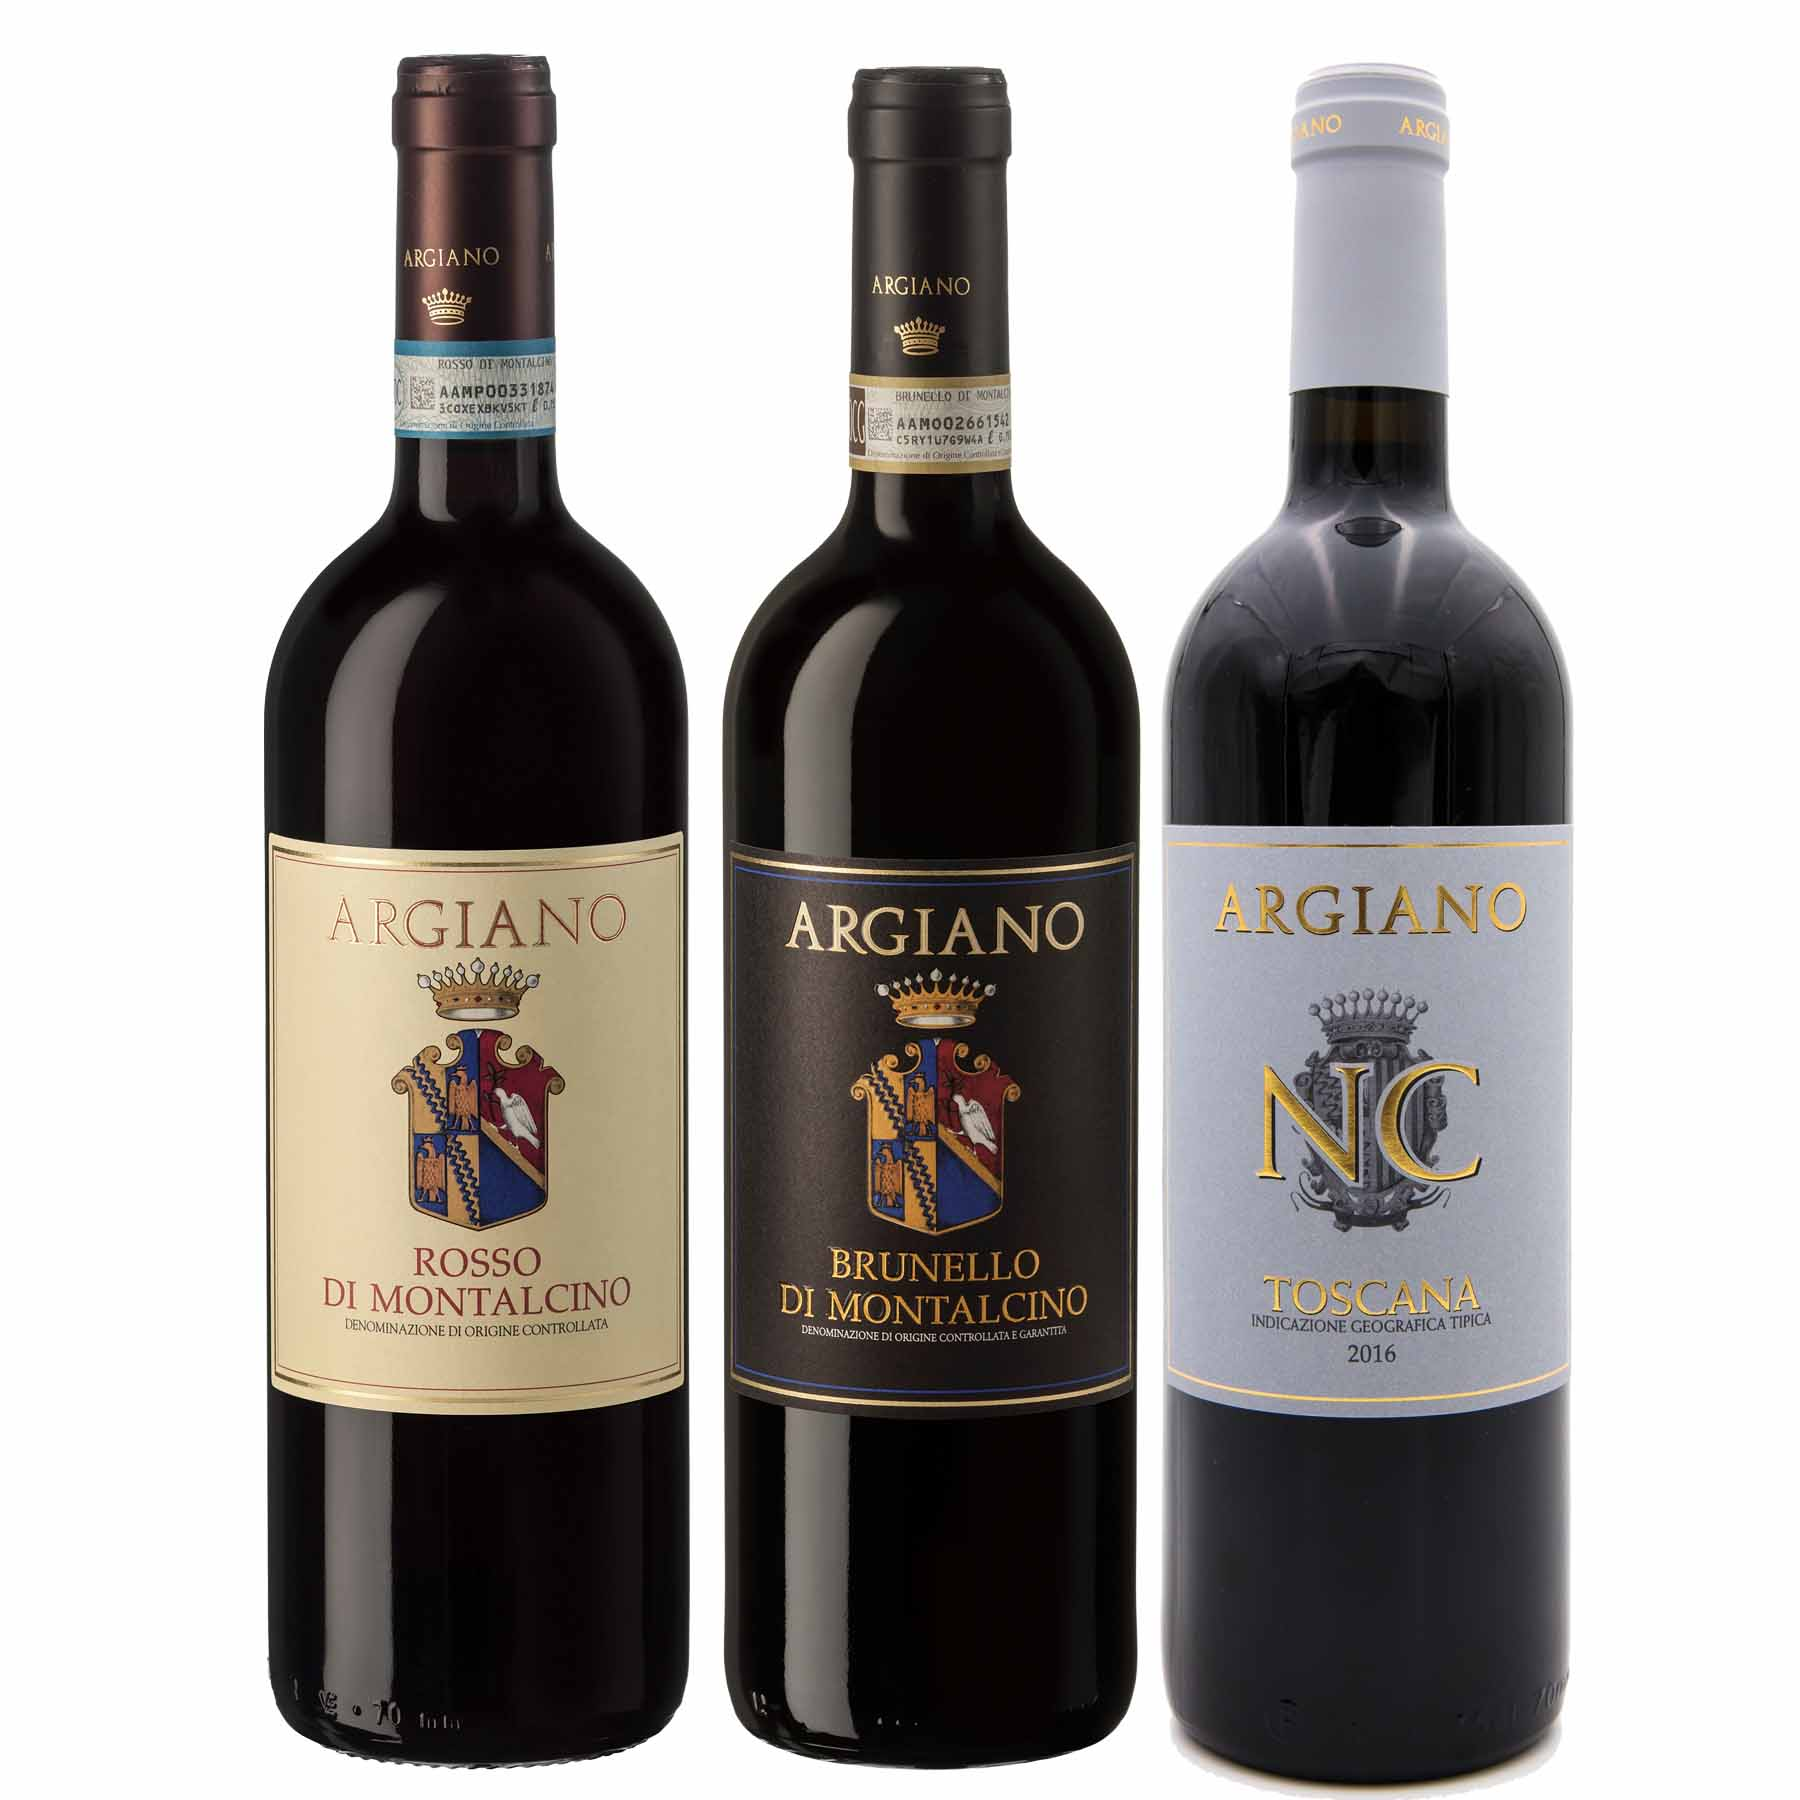 Kit 3x Vinho Tinto Italiano Argiano Toscana: Brunello/Rosso di Montalcino e NC Toscana